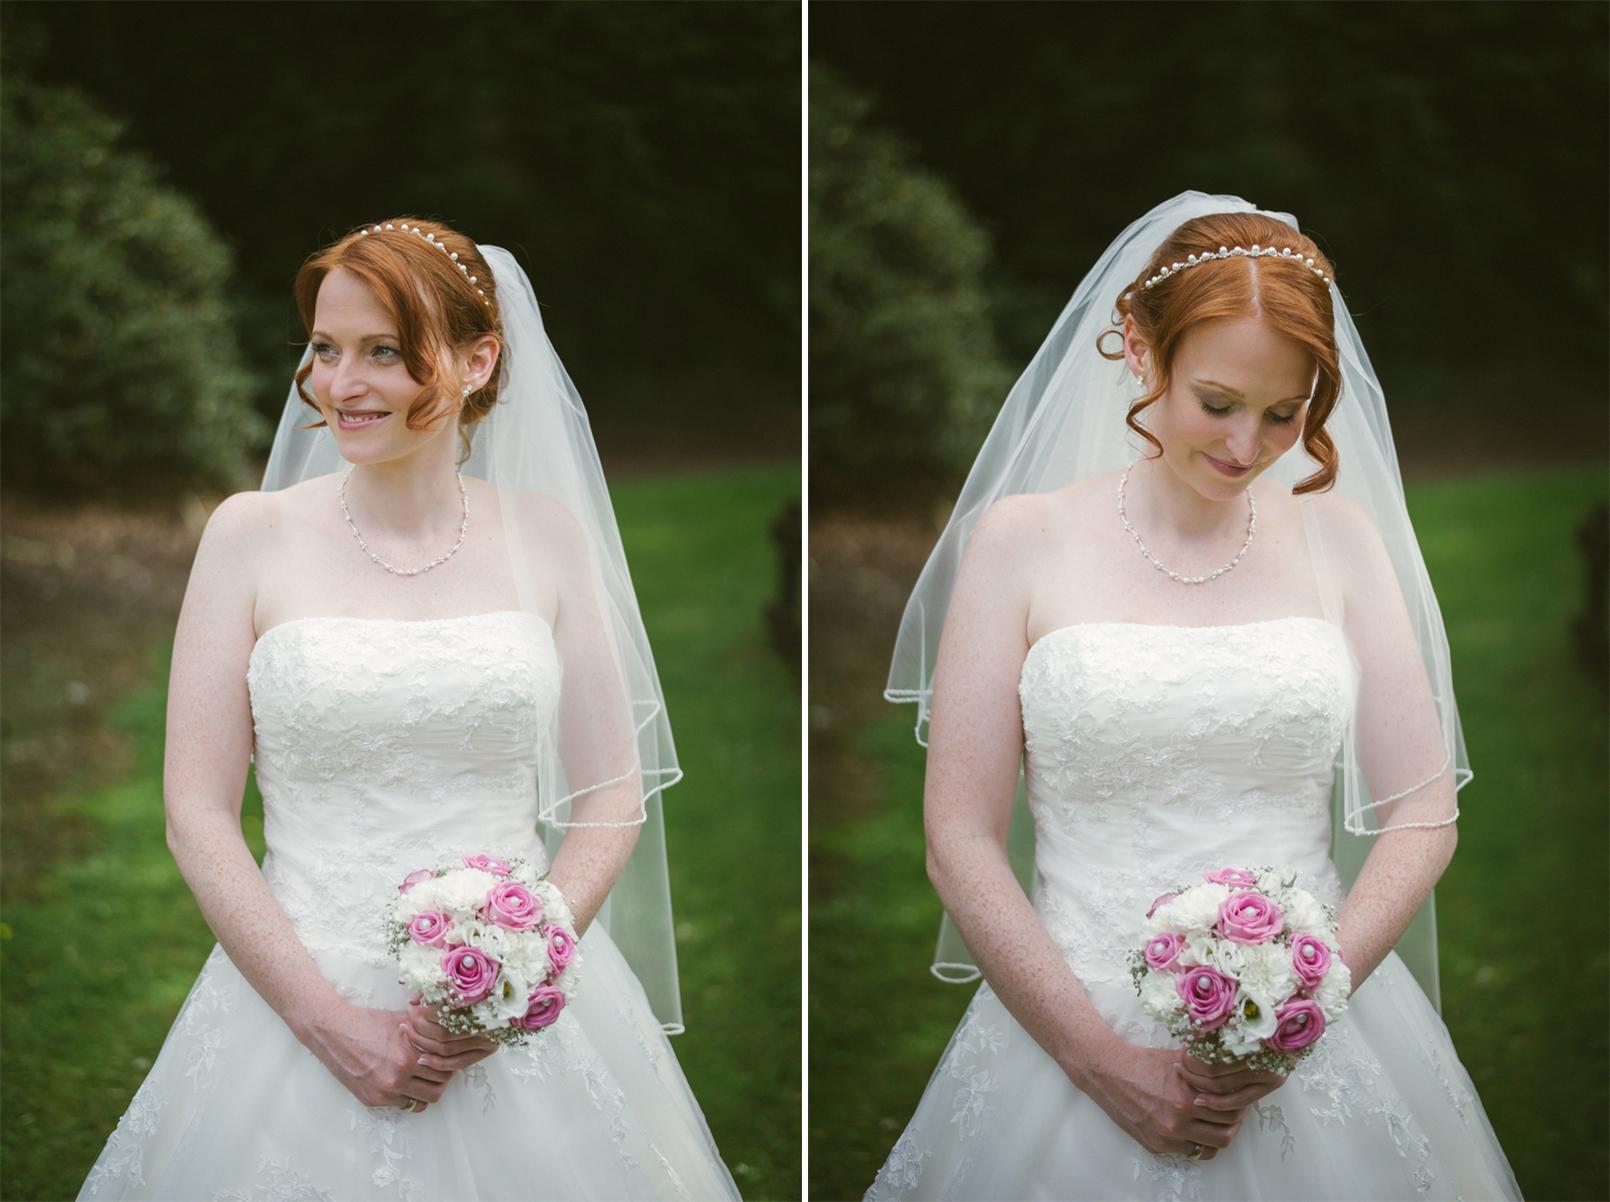 Hochzeitsfotografie-Baesweiler-Aachen-Heinsberg-Dreamcatcher-Photography-0035